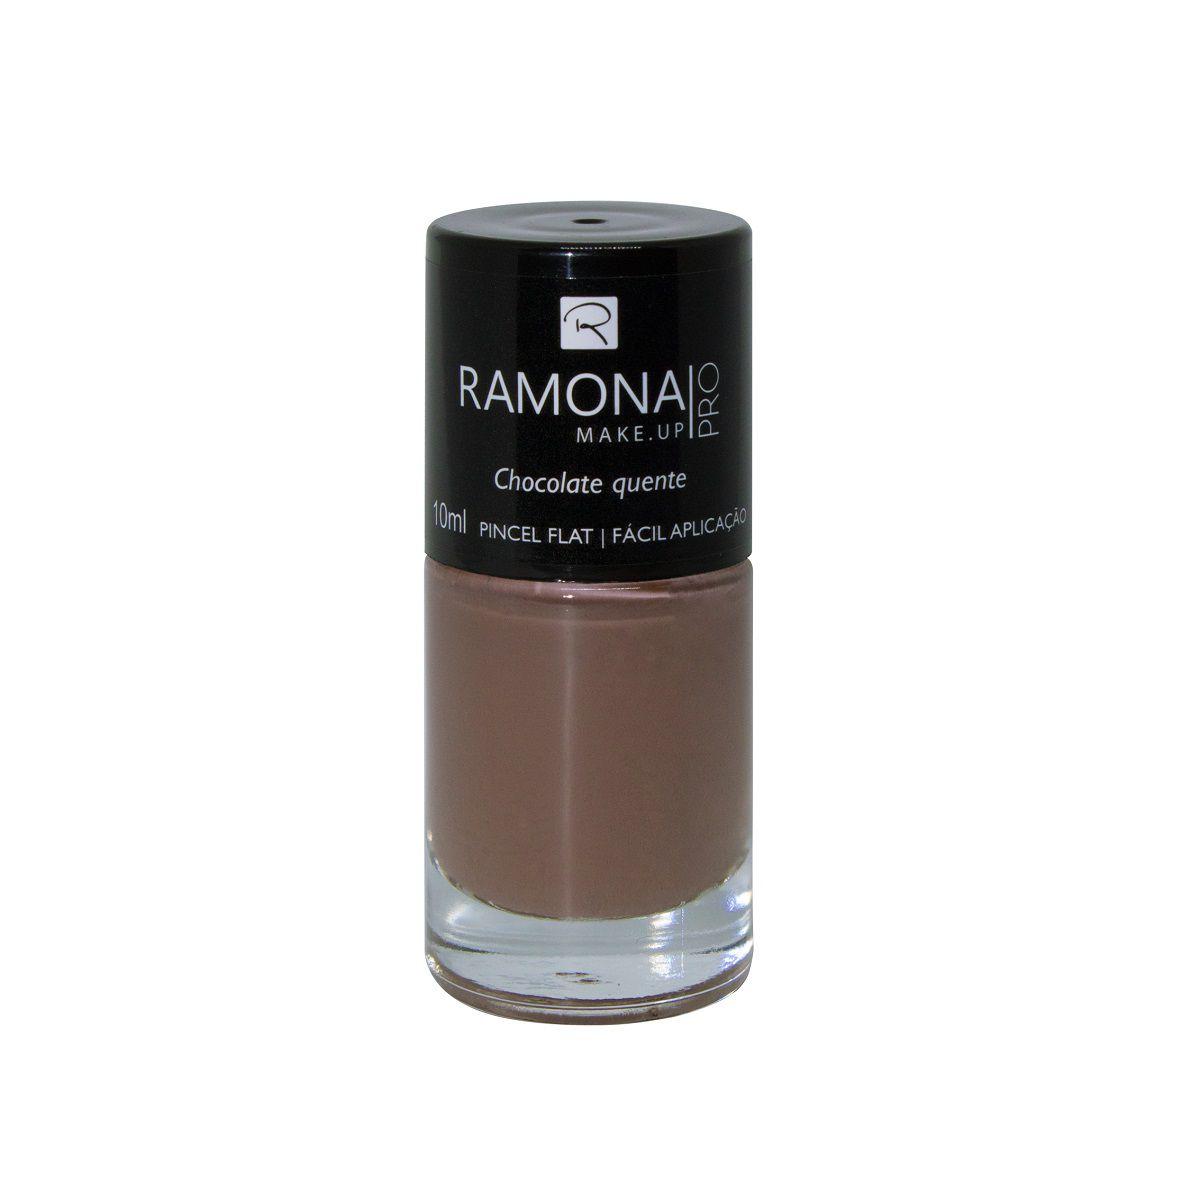 Esmalte cremoso Ramona Cosméticos Chocolate quente 10ml